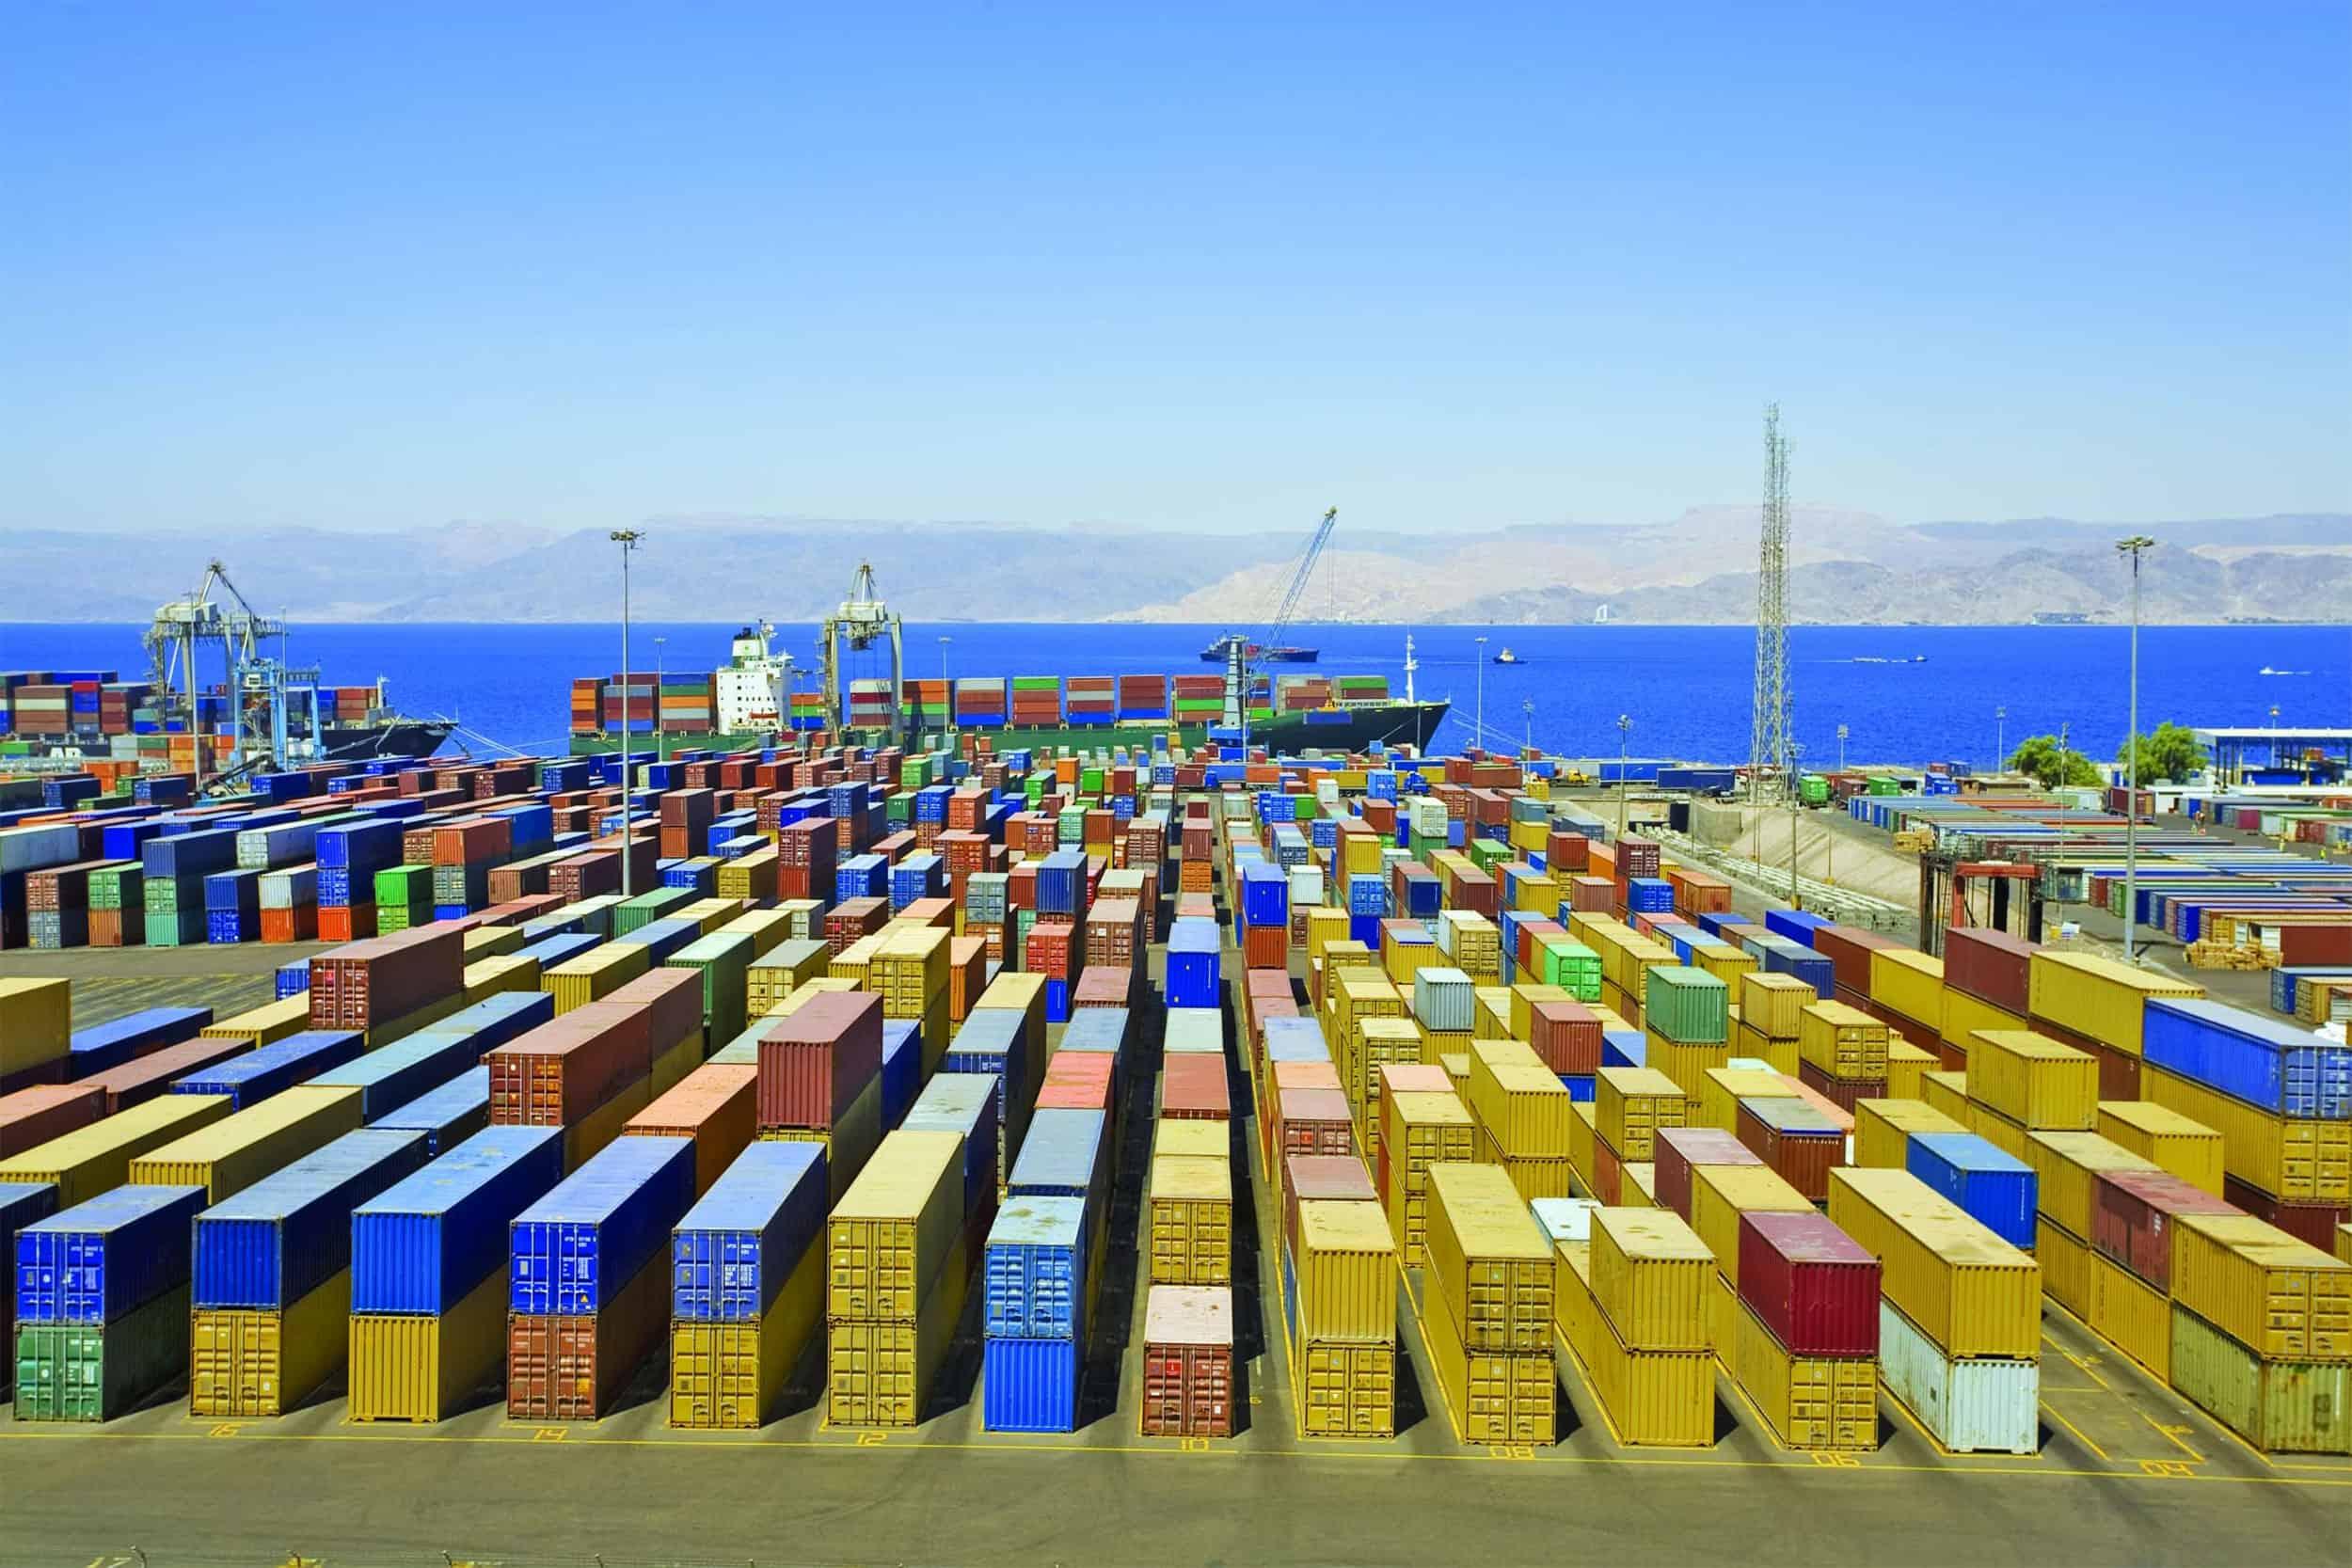 https://transnautic.b-cdn.net/wp-content/uploads/2015/09/Harbor-warehouse.jpg